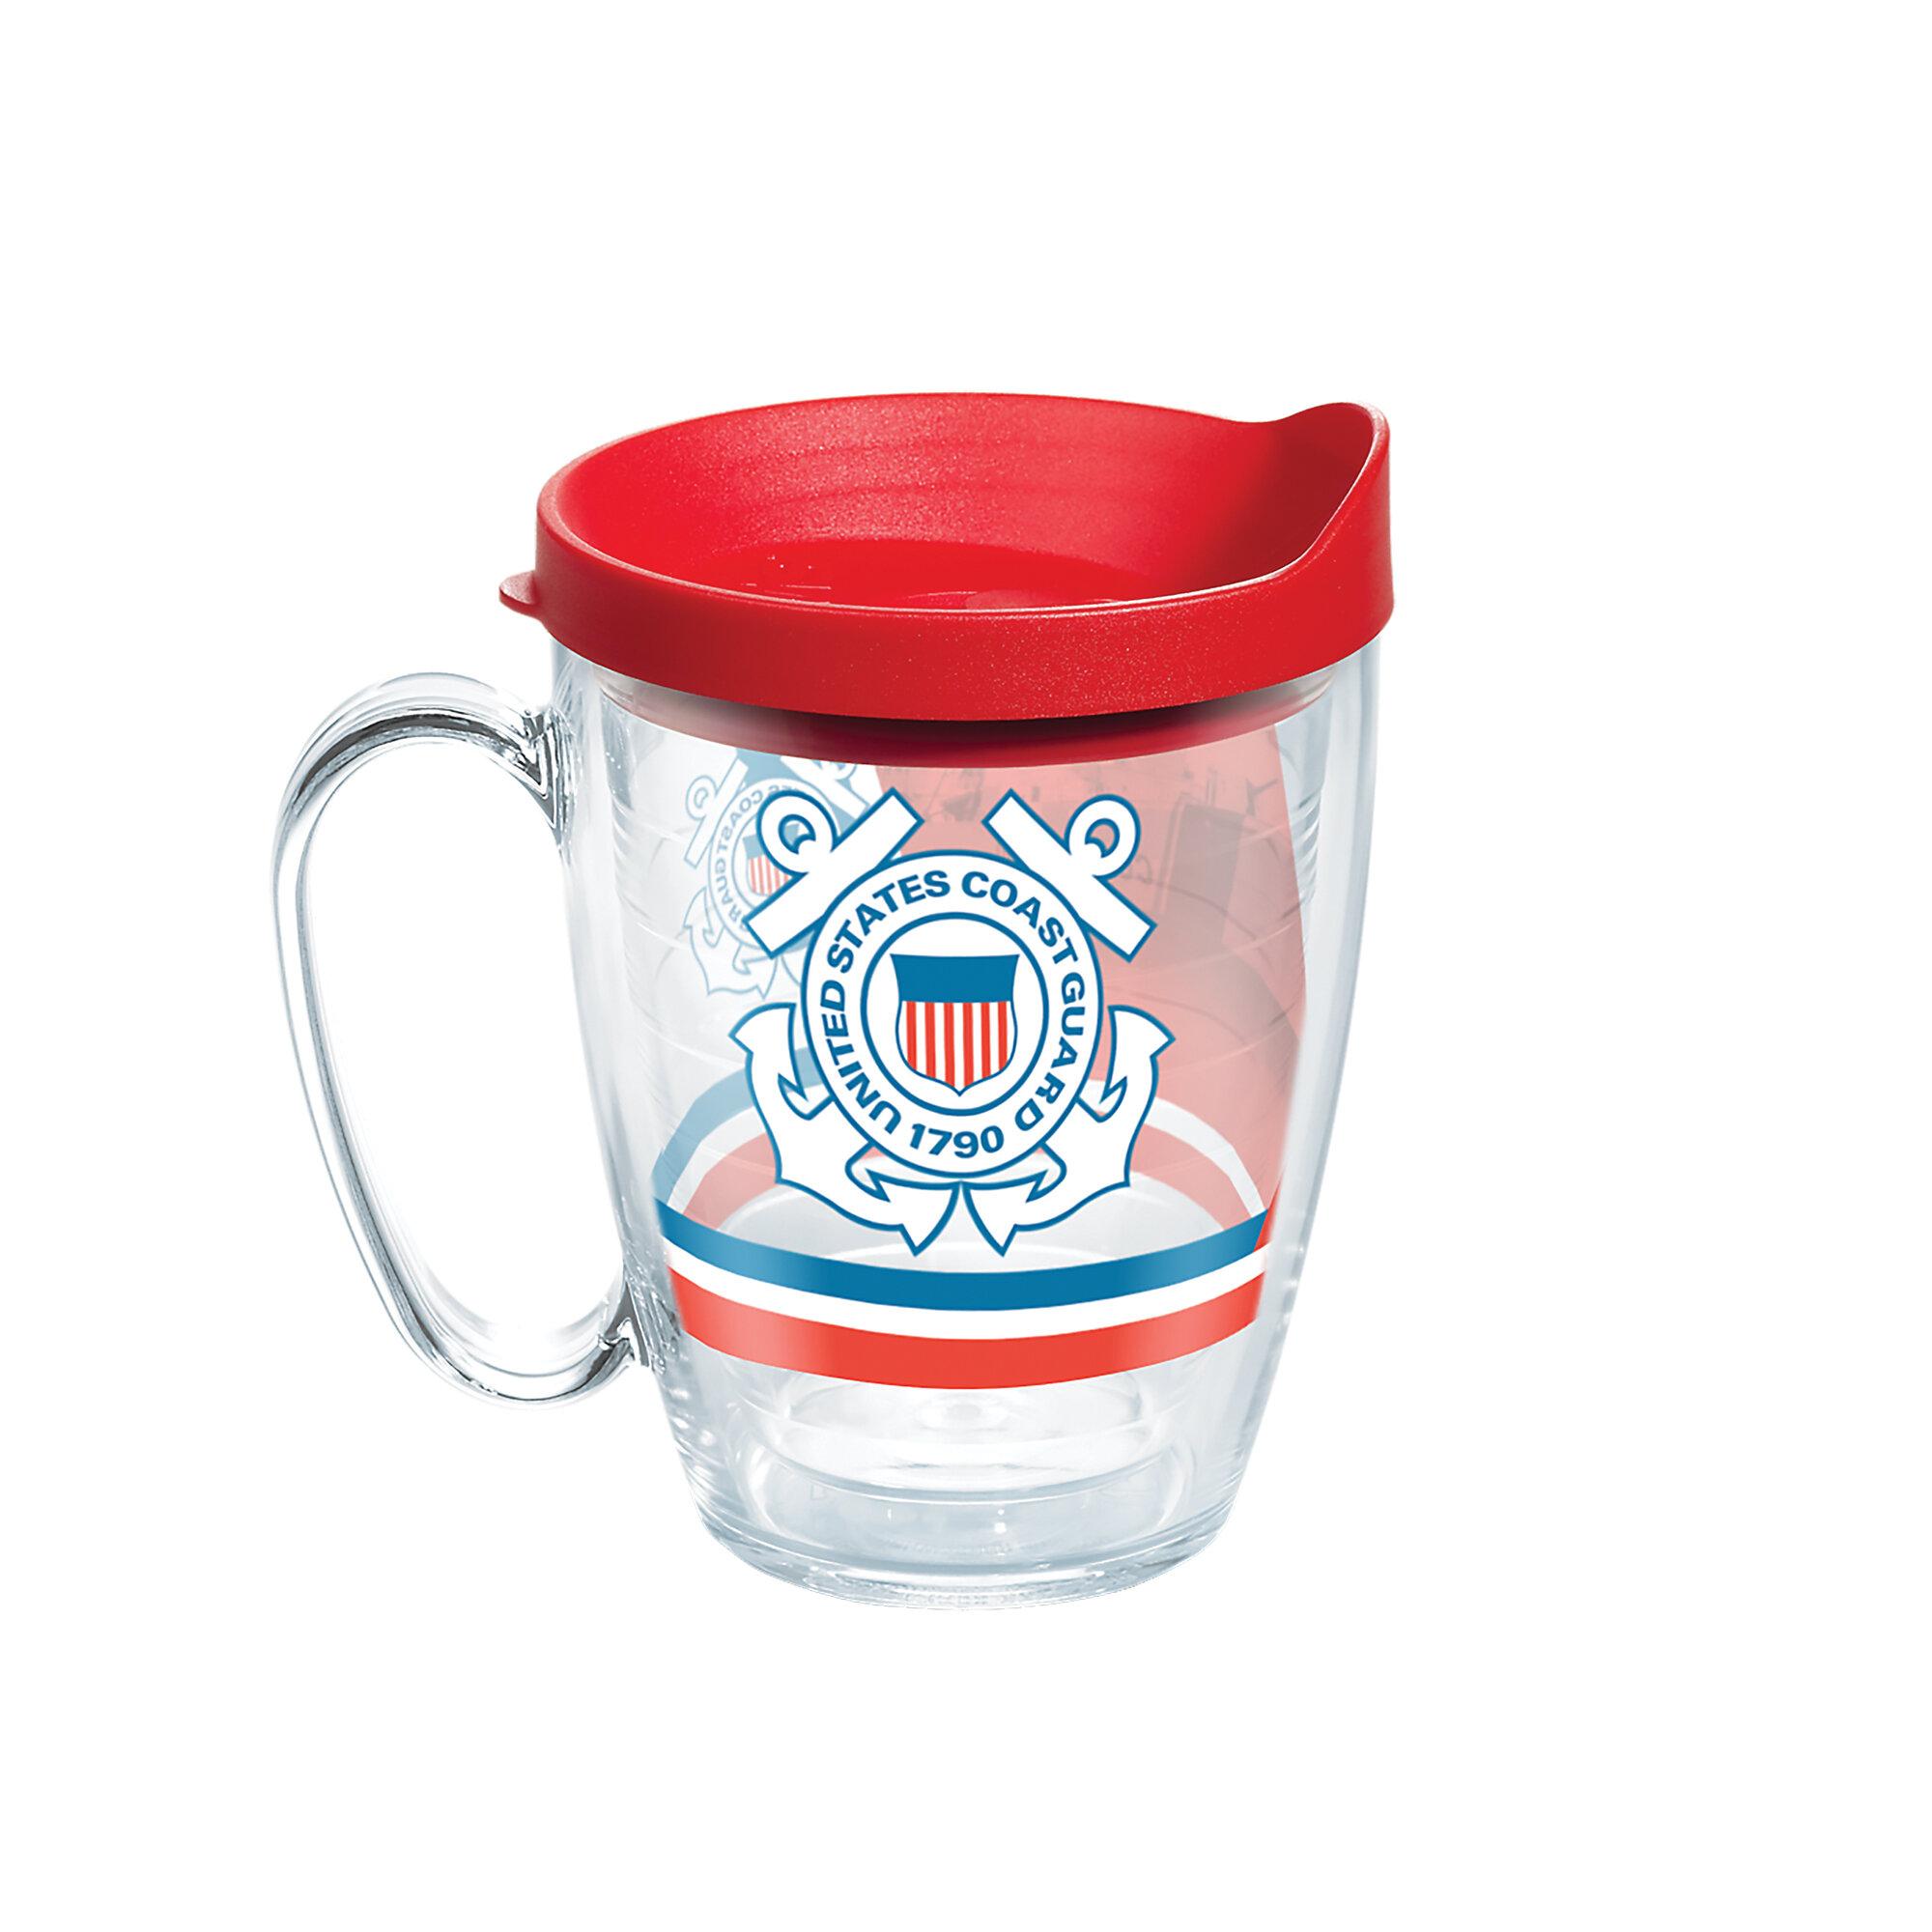 Tervis Tumbler American Pride Uscg Forever Proud 16 Oz Insulated Tritan Plastic Travel Mug Wayfair